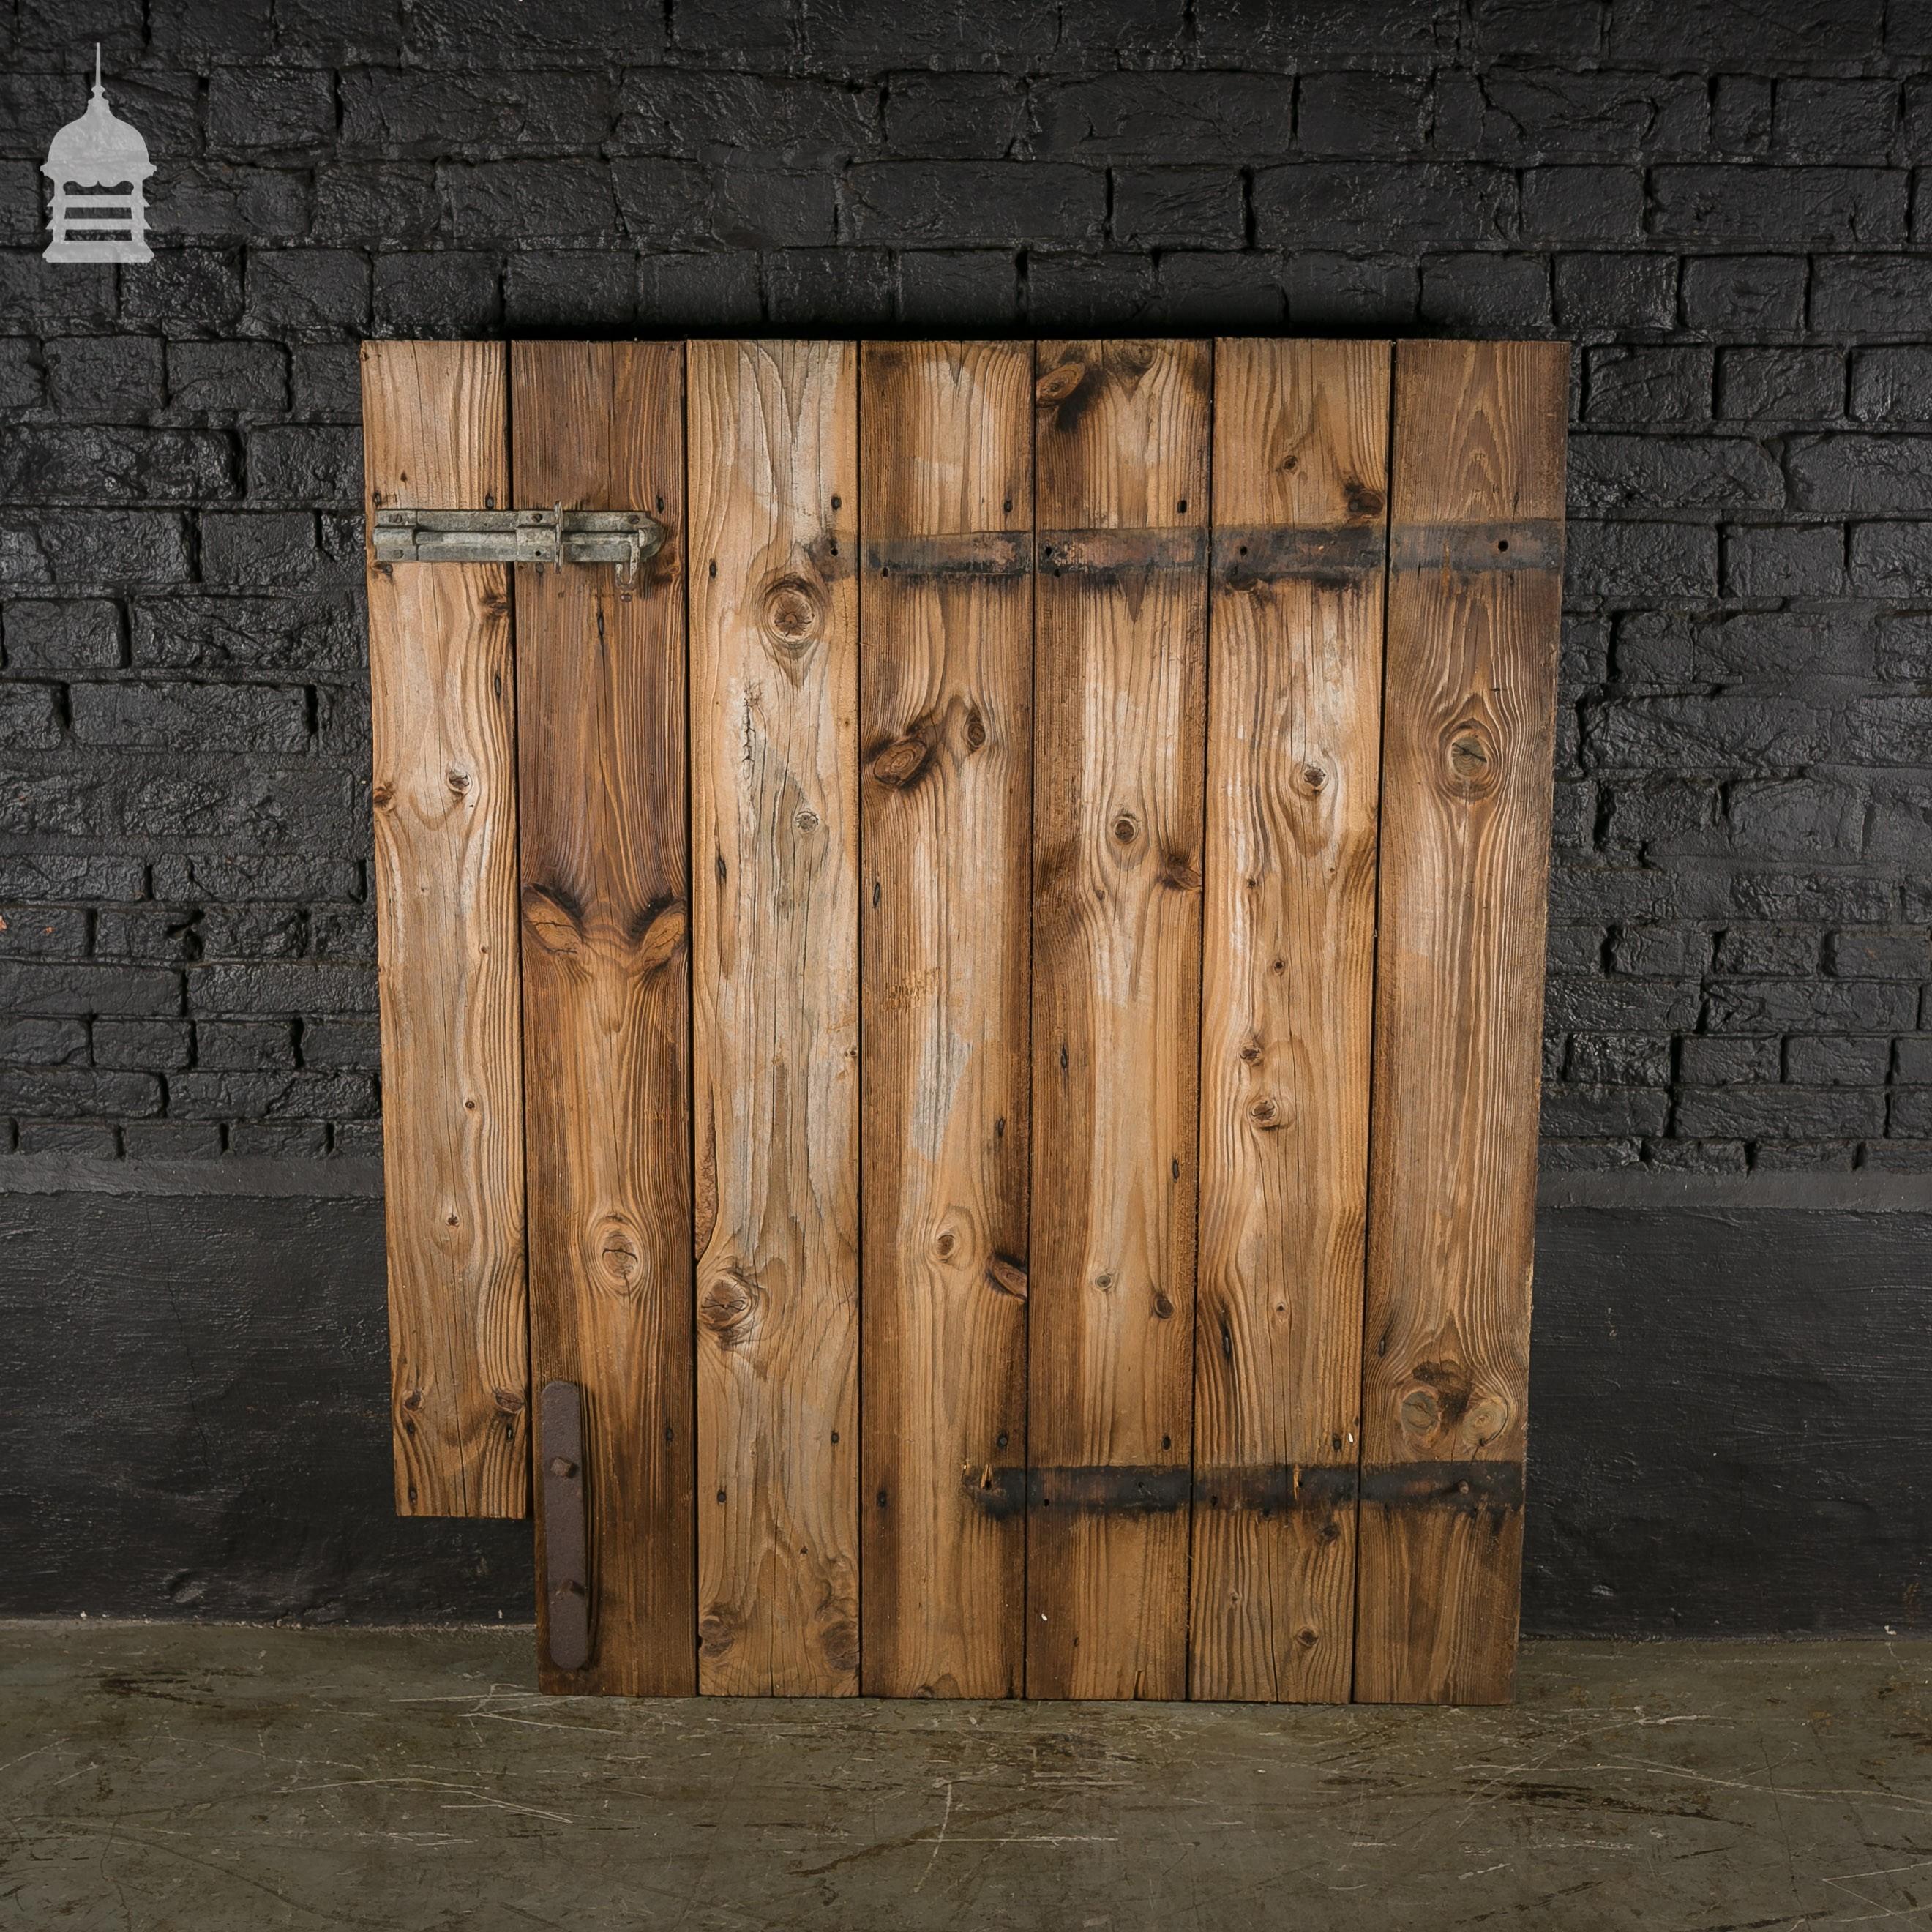 Rustic Pine Ledged and Braced Barn Door